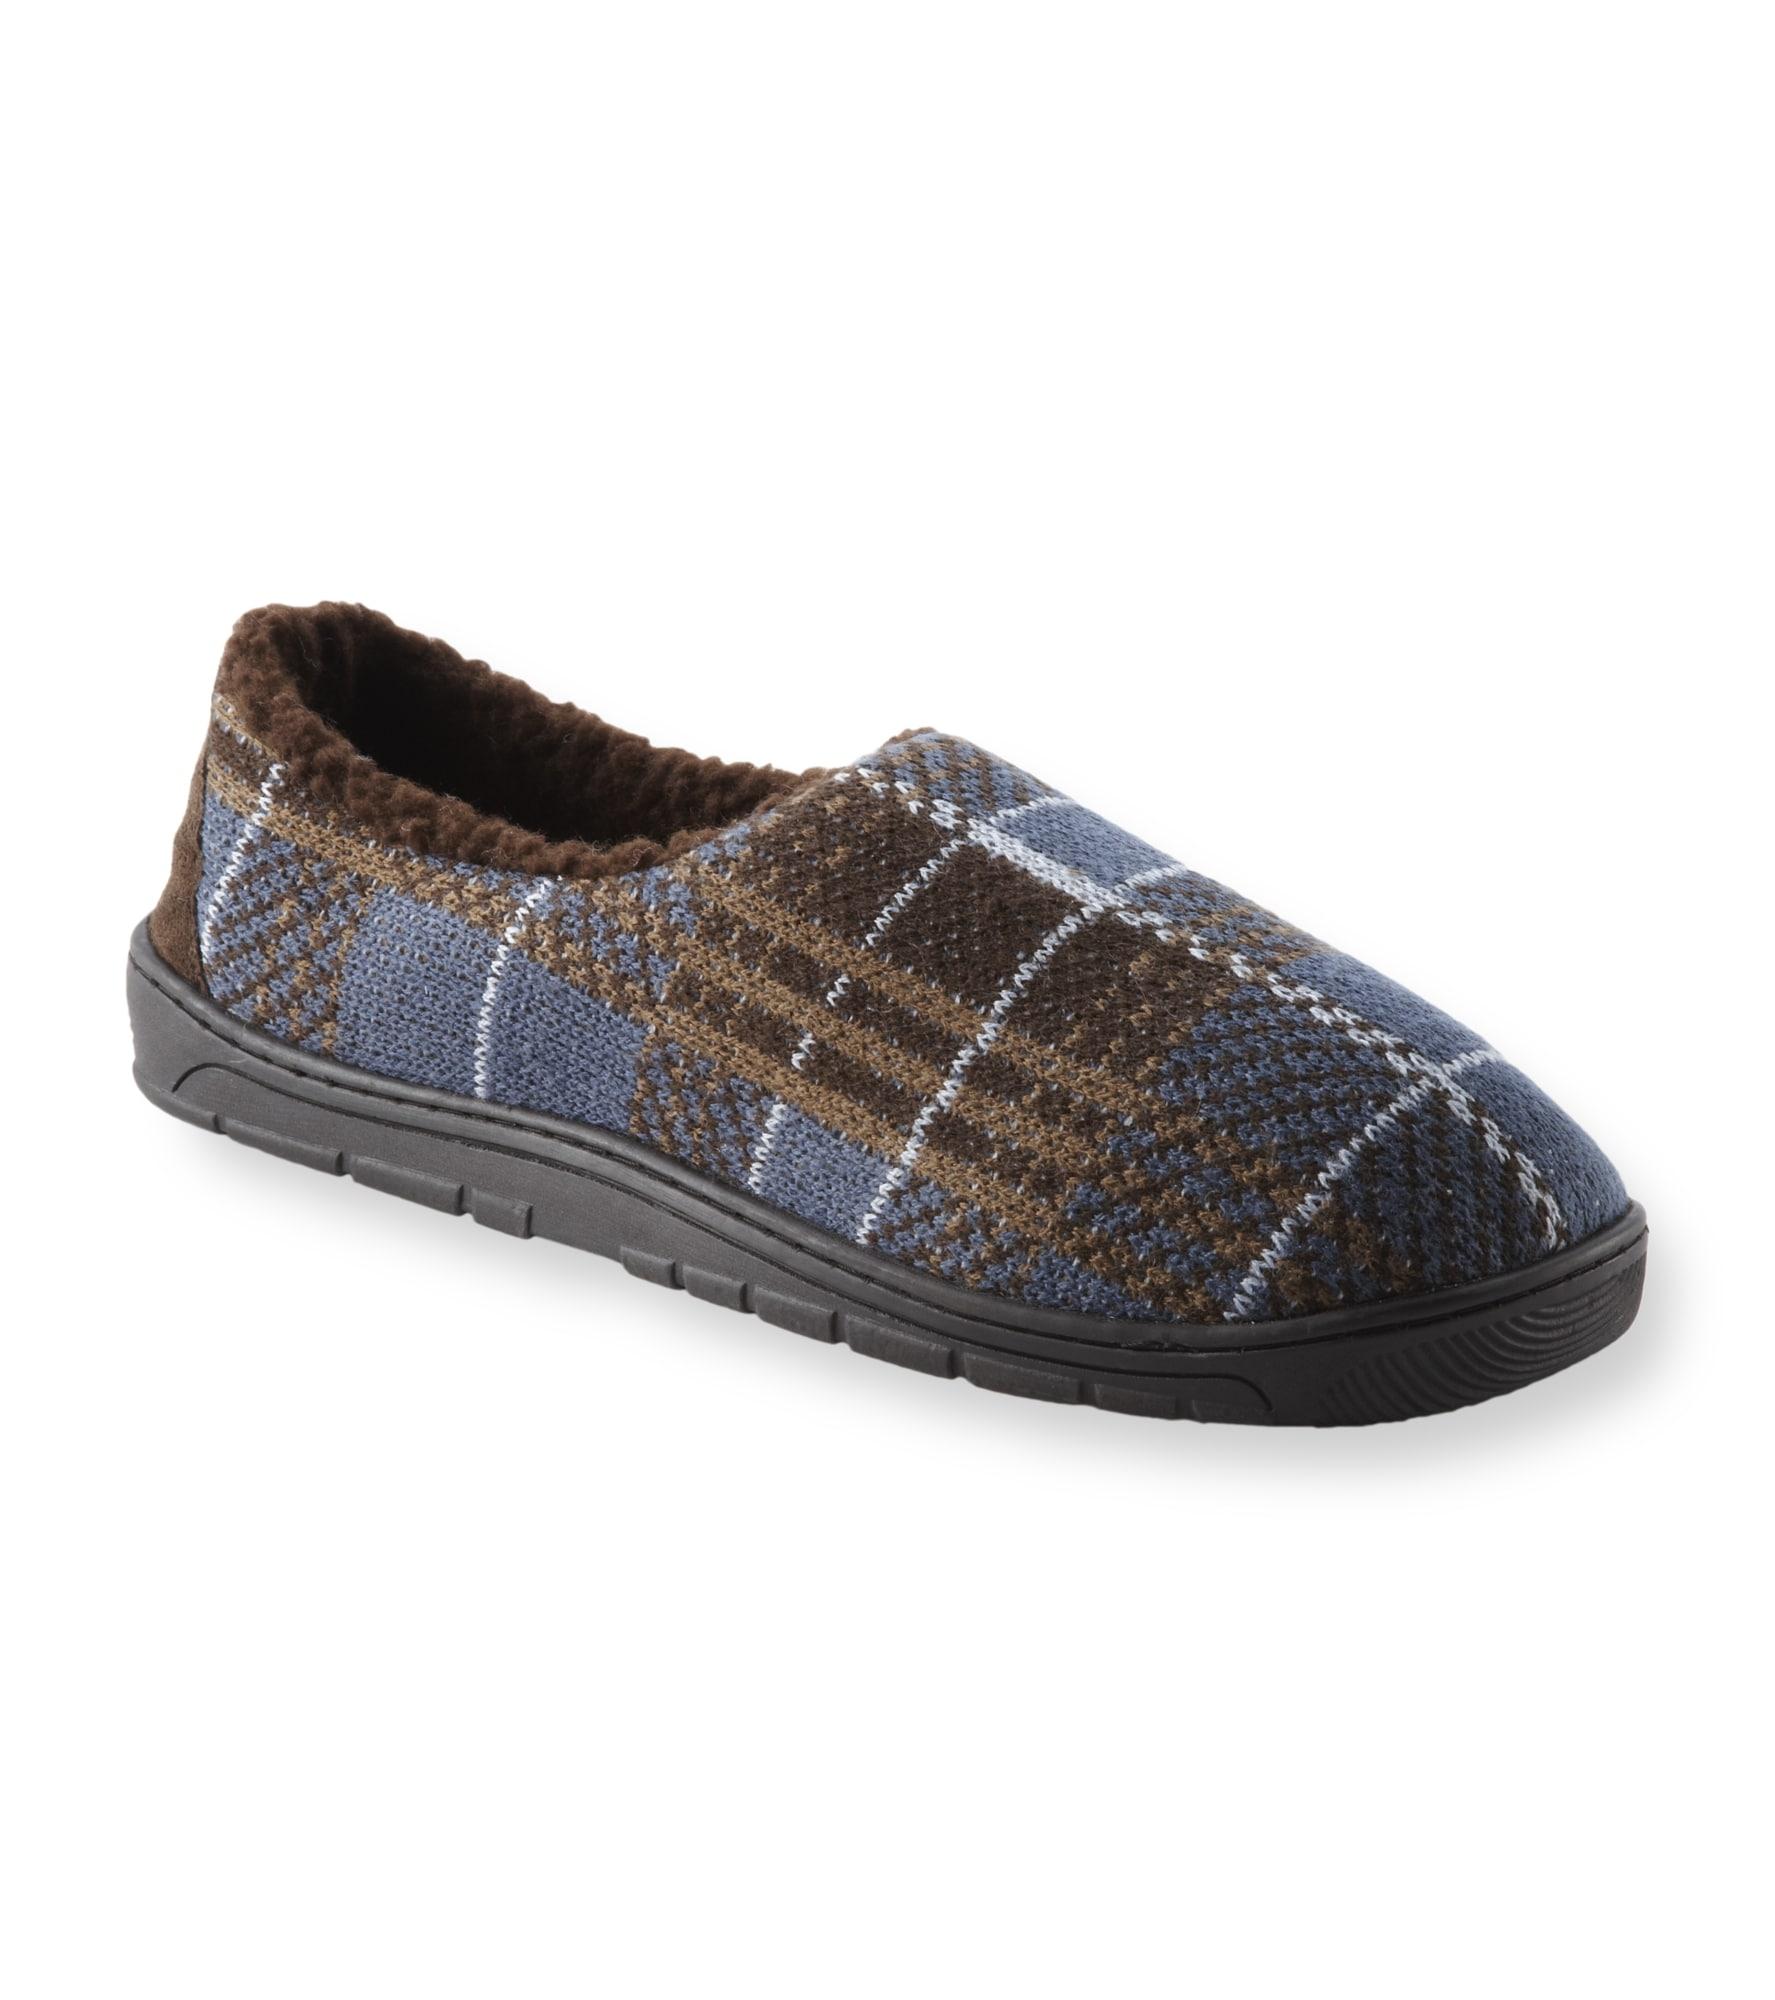 Muk Luks Men's 'Tom' Brown Plaid Knit Foot Slippers